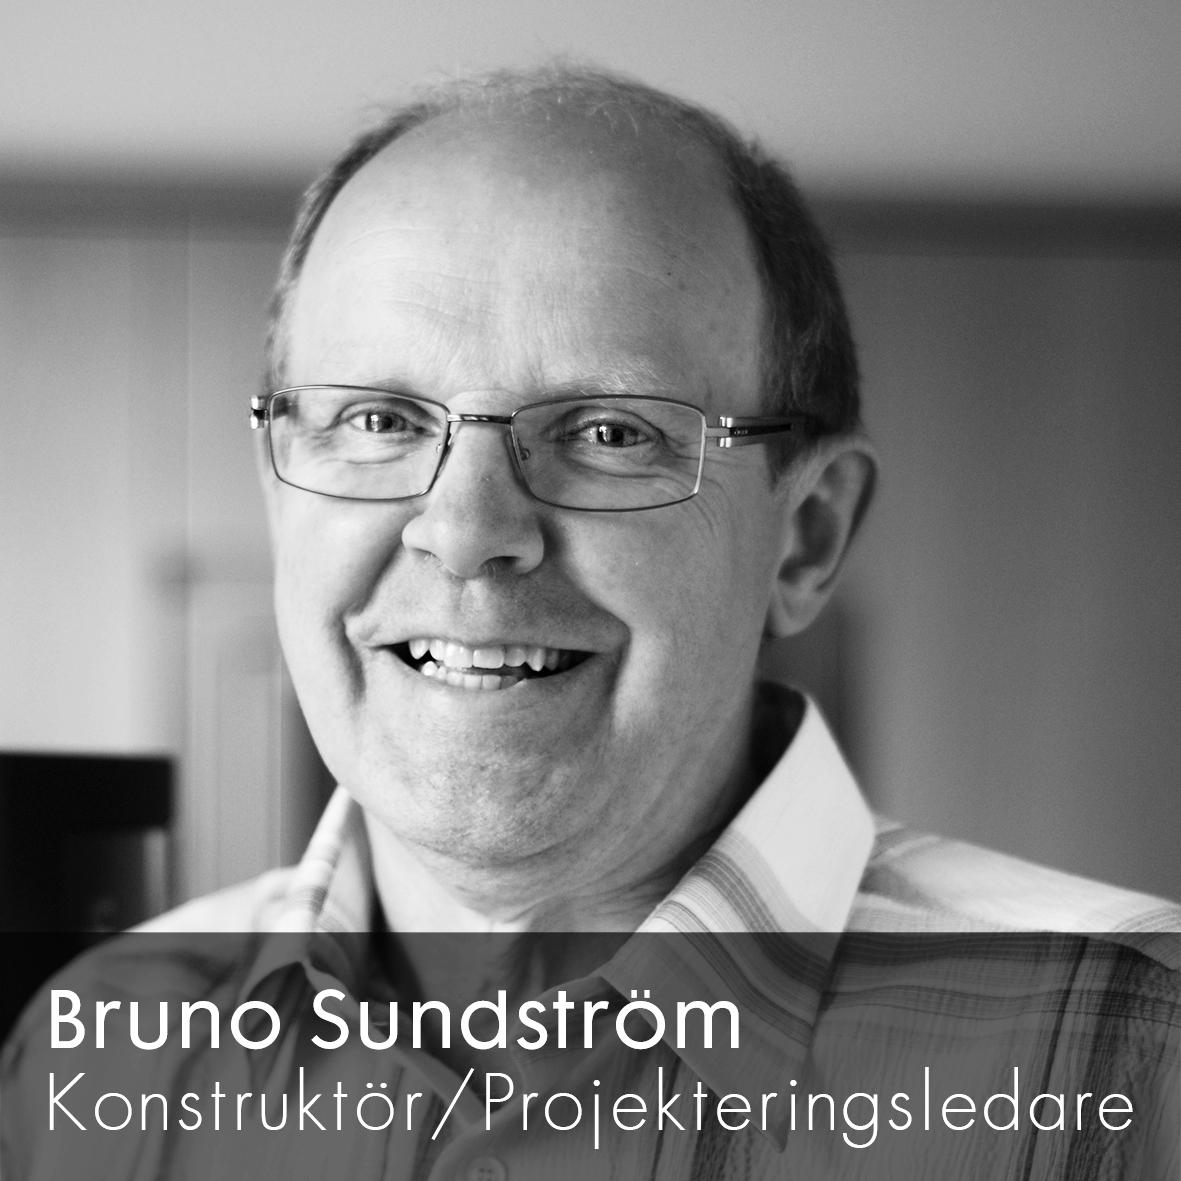 1 bruno sundström.jpg